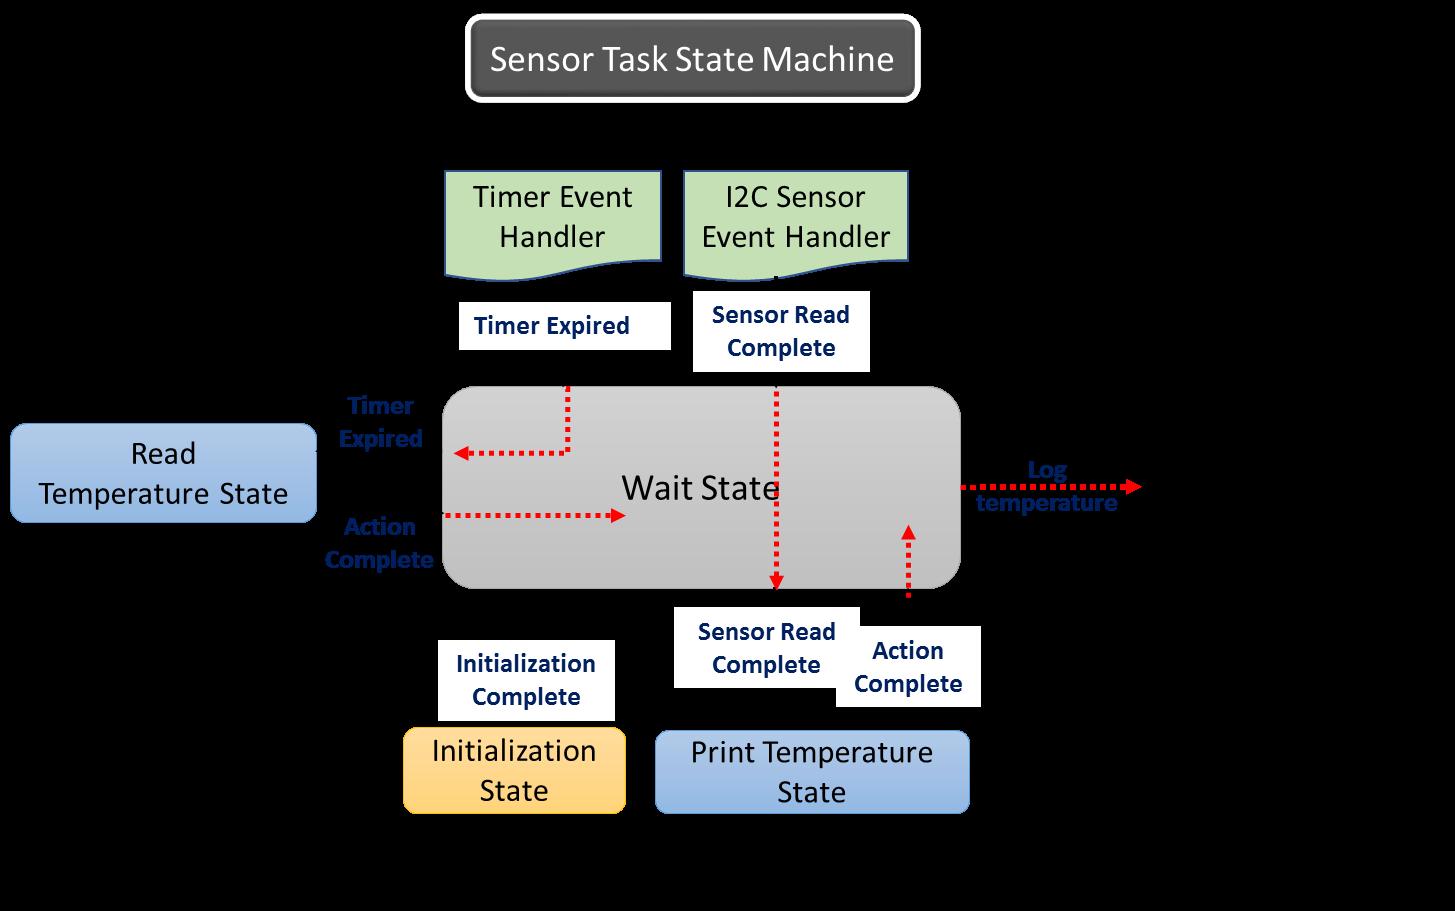 sensor_task_state_machine.png